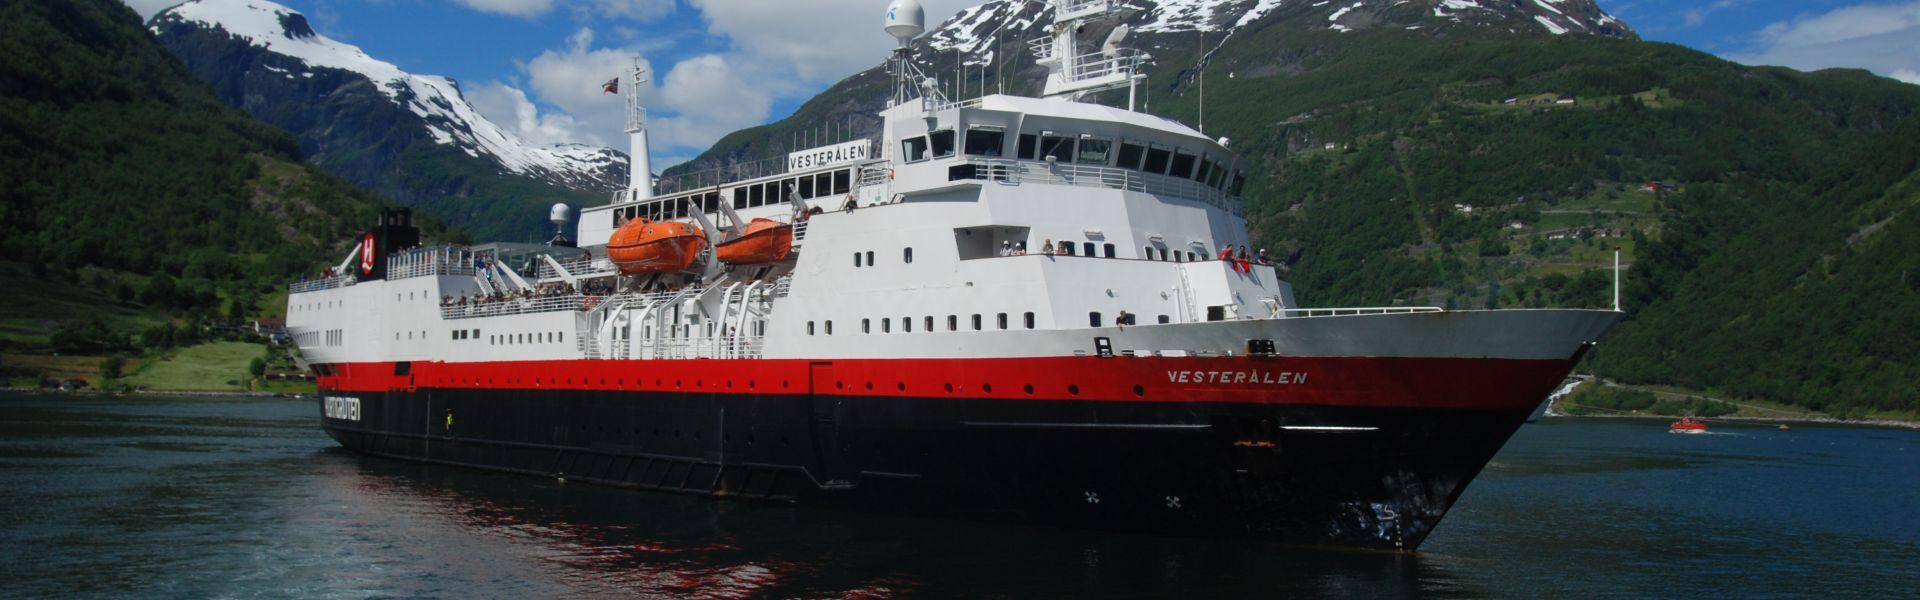 Croaziera 2017 - Scandinavia si Fiordurile Norvegiene (Kirkenes) - Hurtigruten - MS Vesteralen - 5 nopti